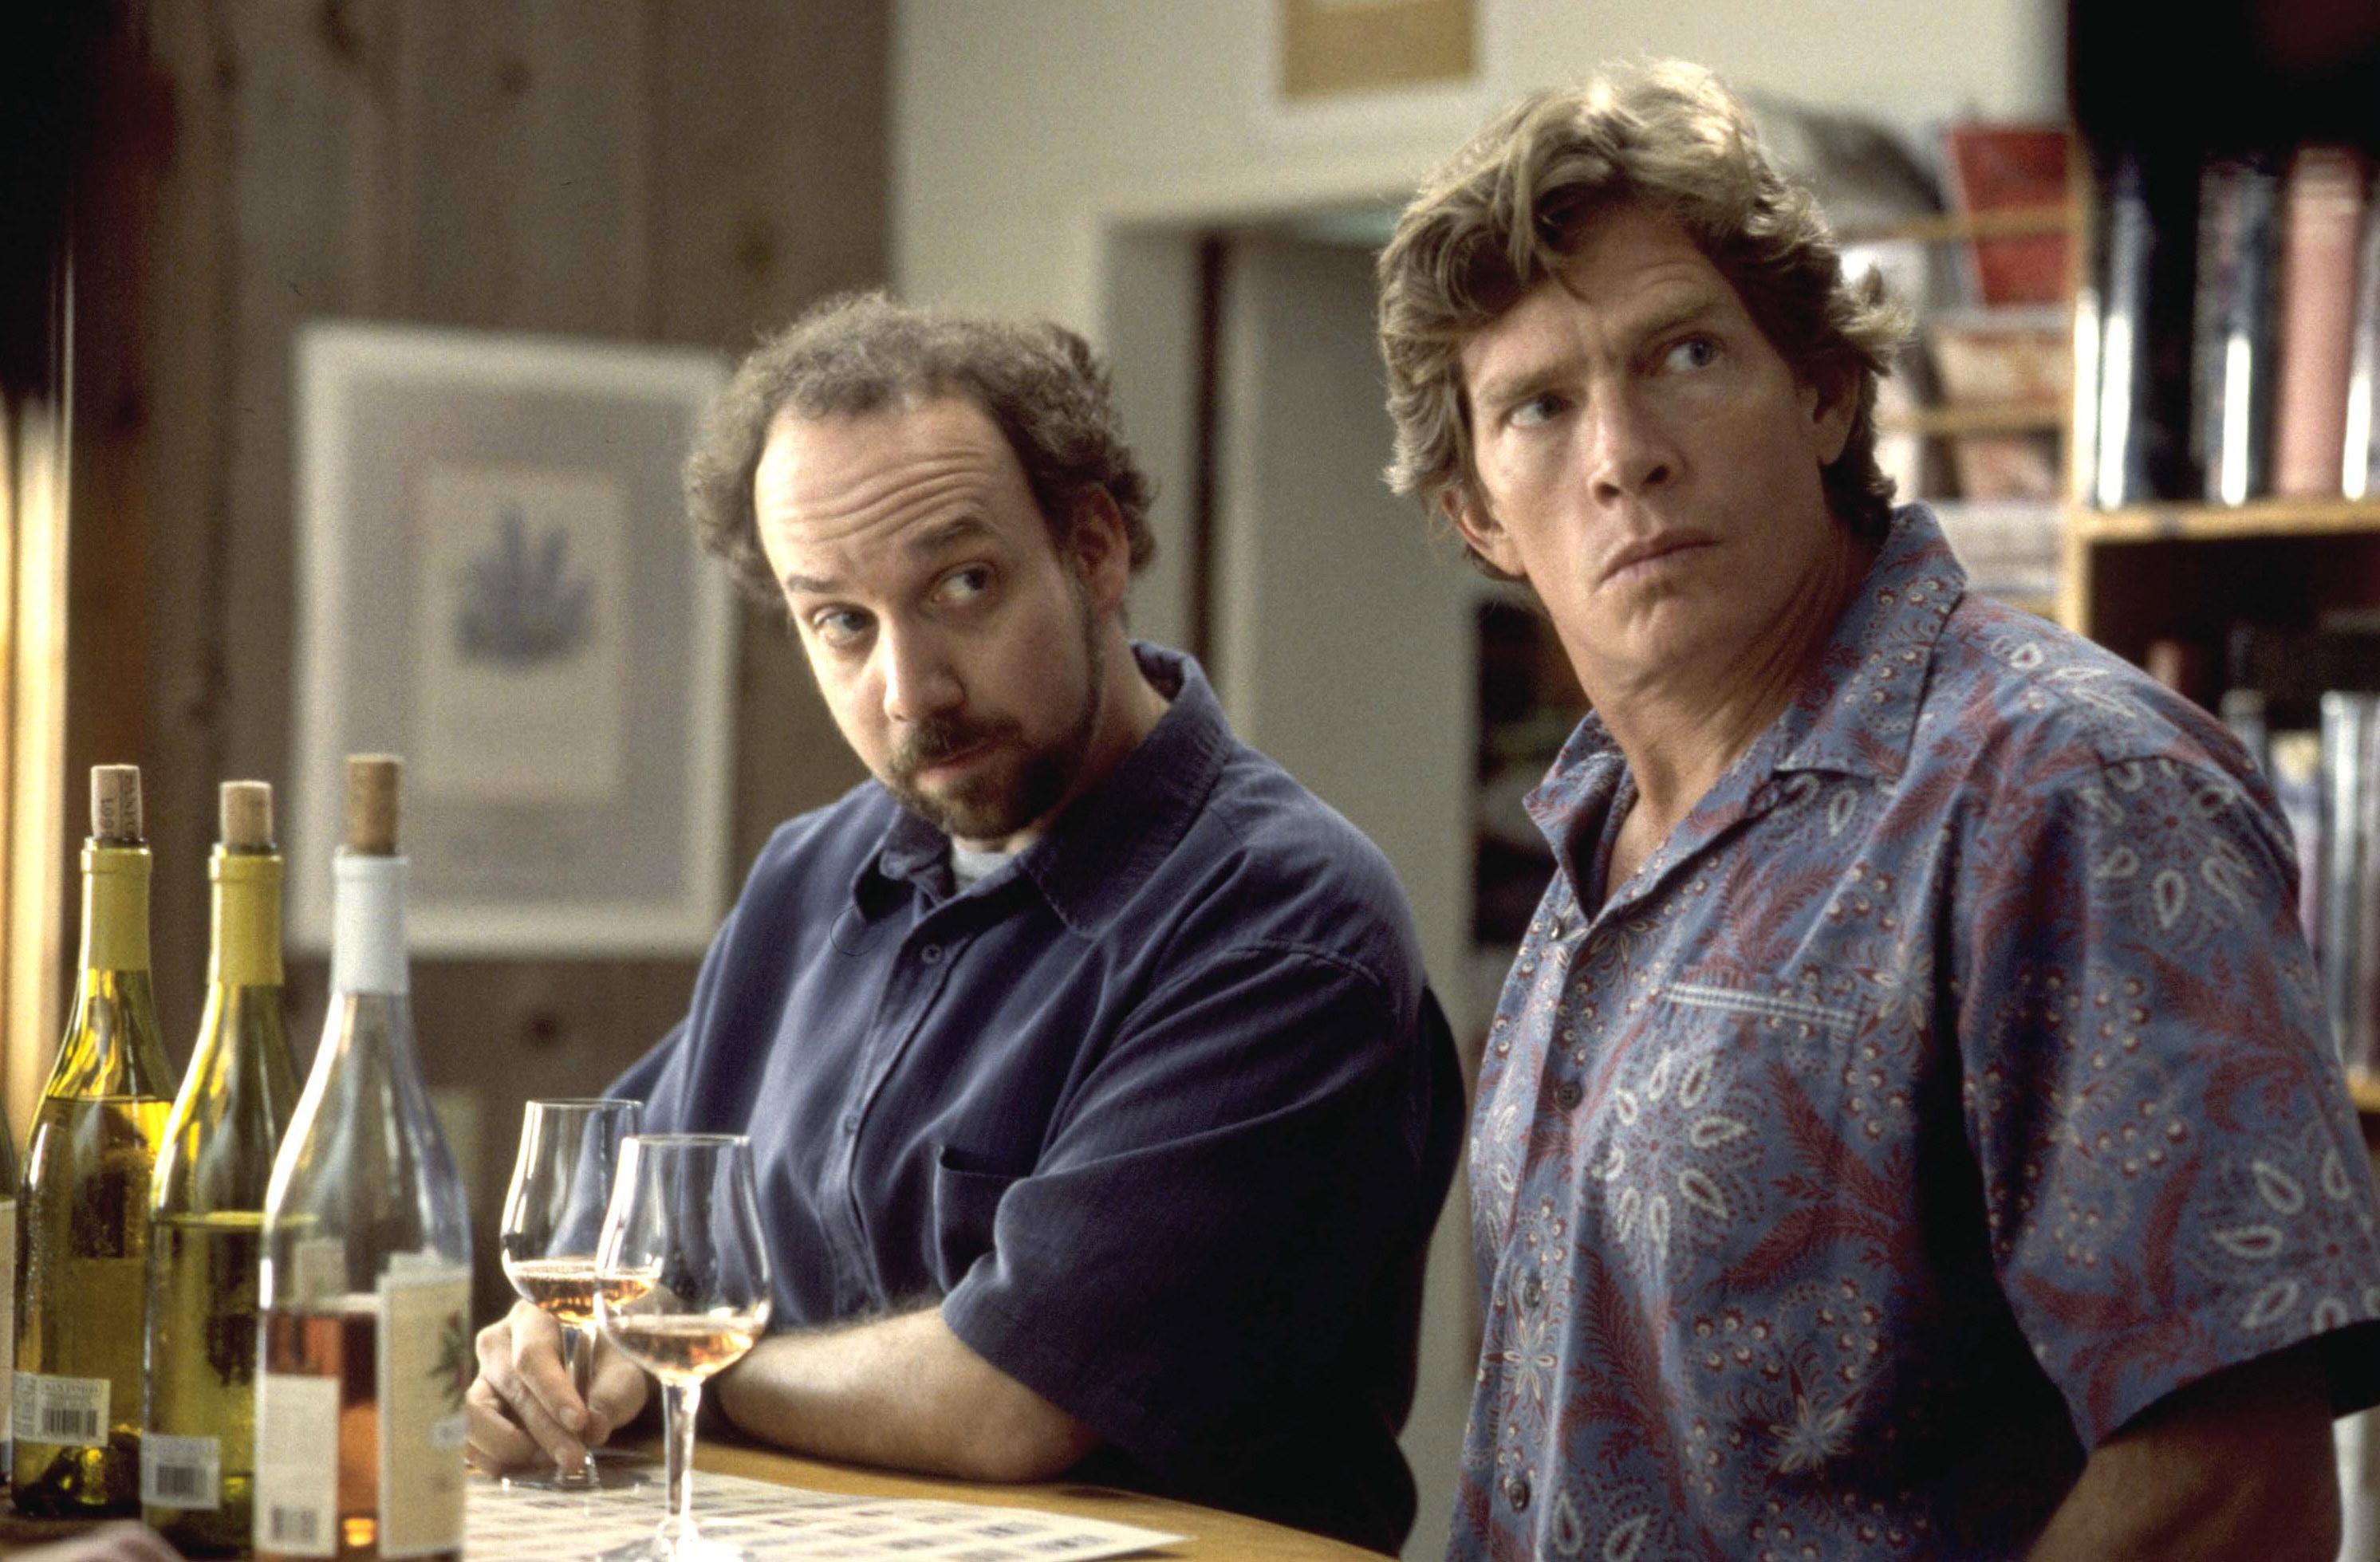 Paul Giamatti and Thomas Haden Church drink wine